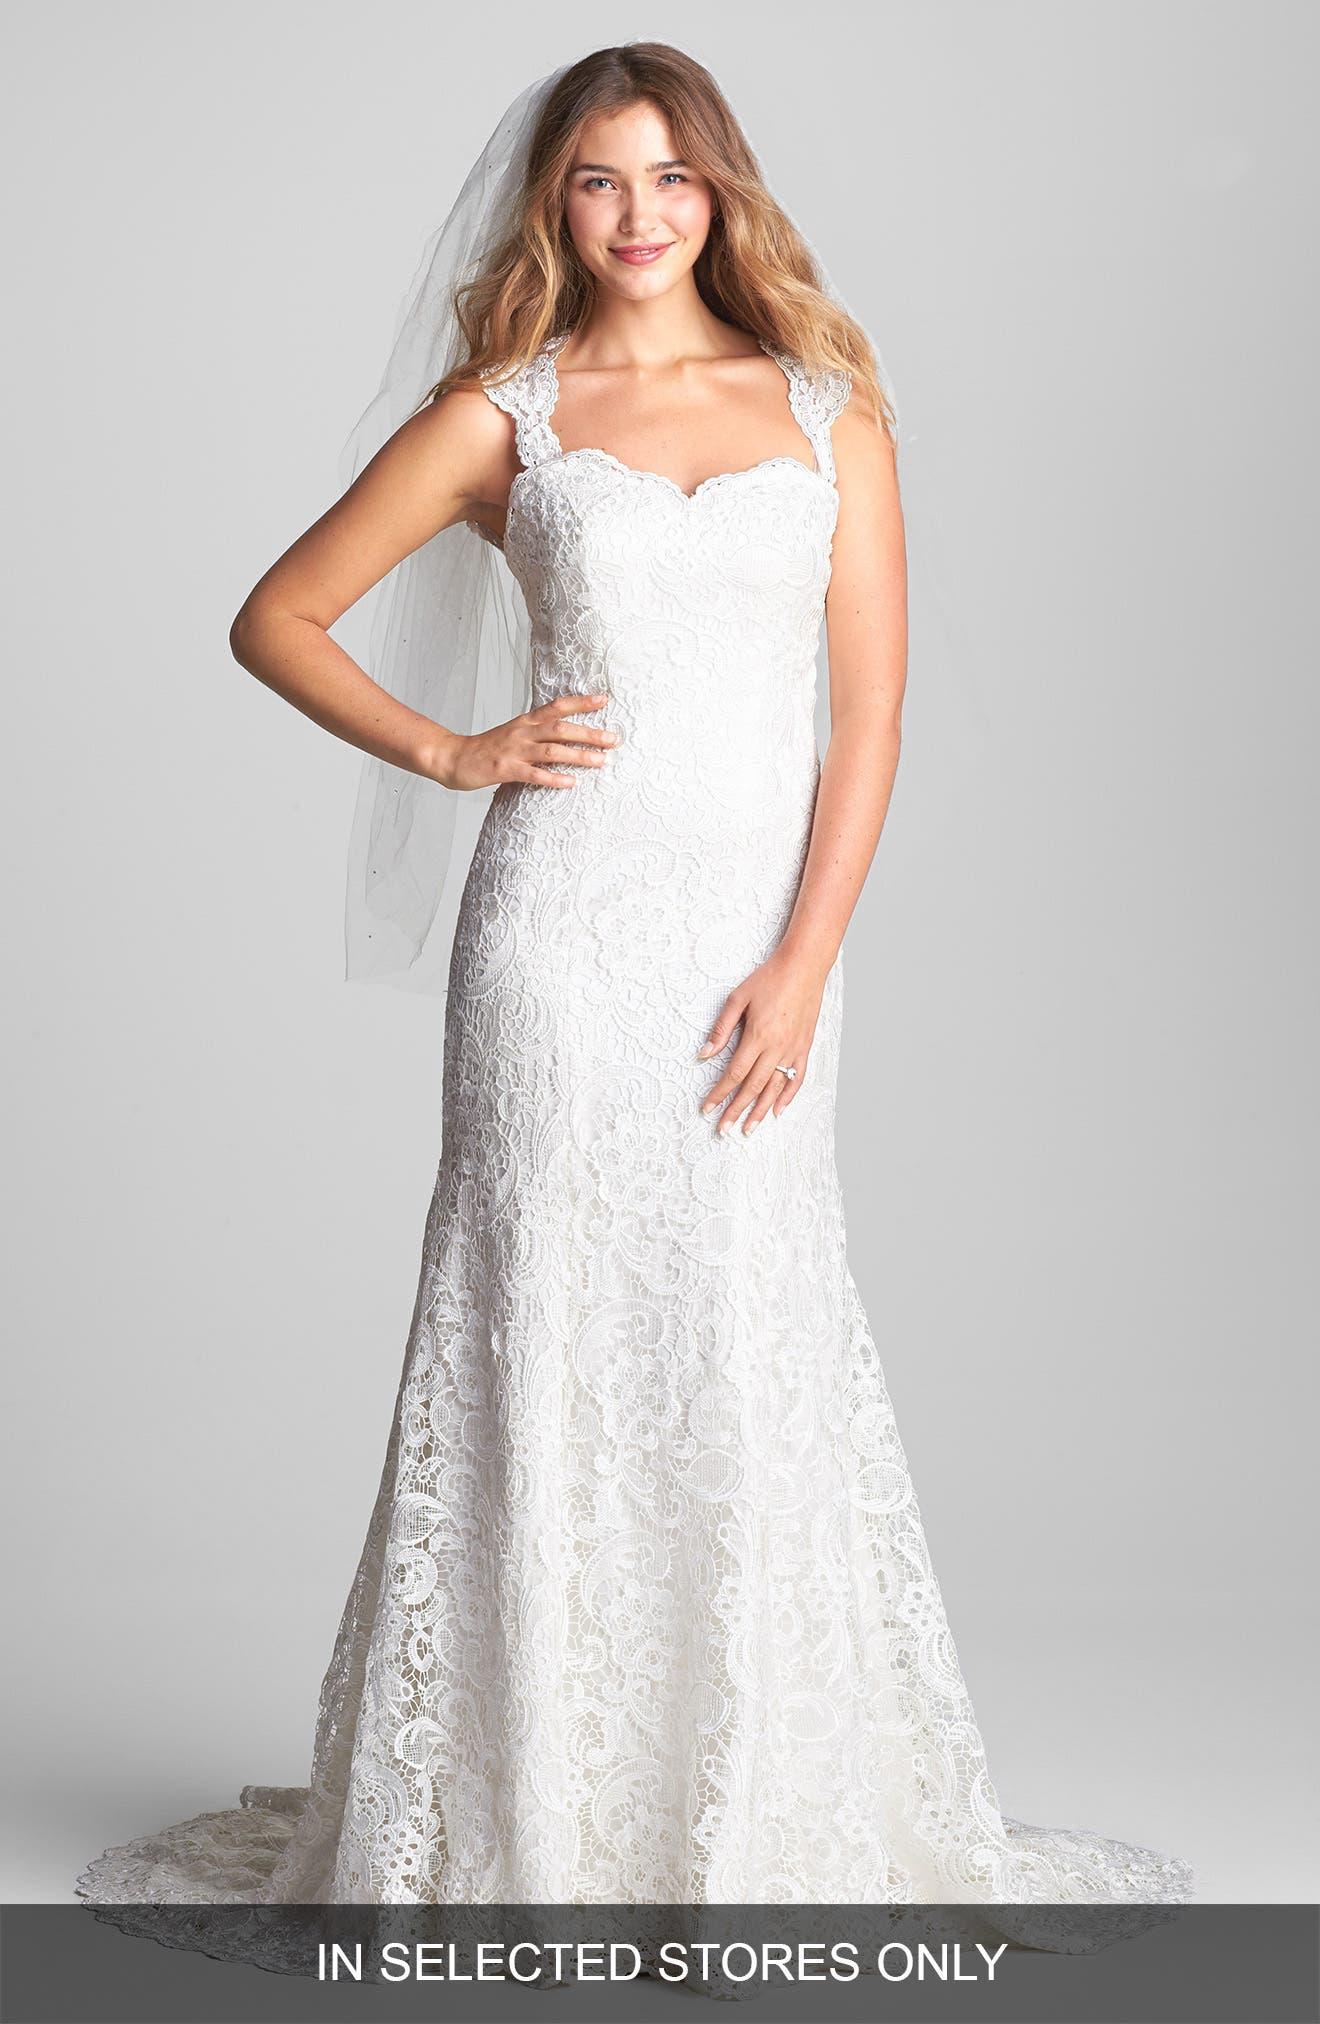 Alternate Image 1 Selected - Olia Zavozina Ann Lace Fluted Dress